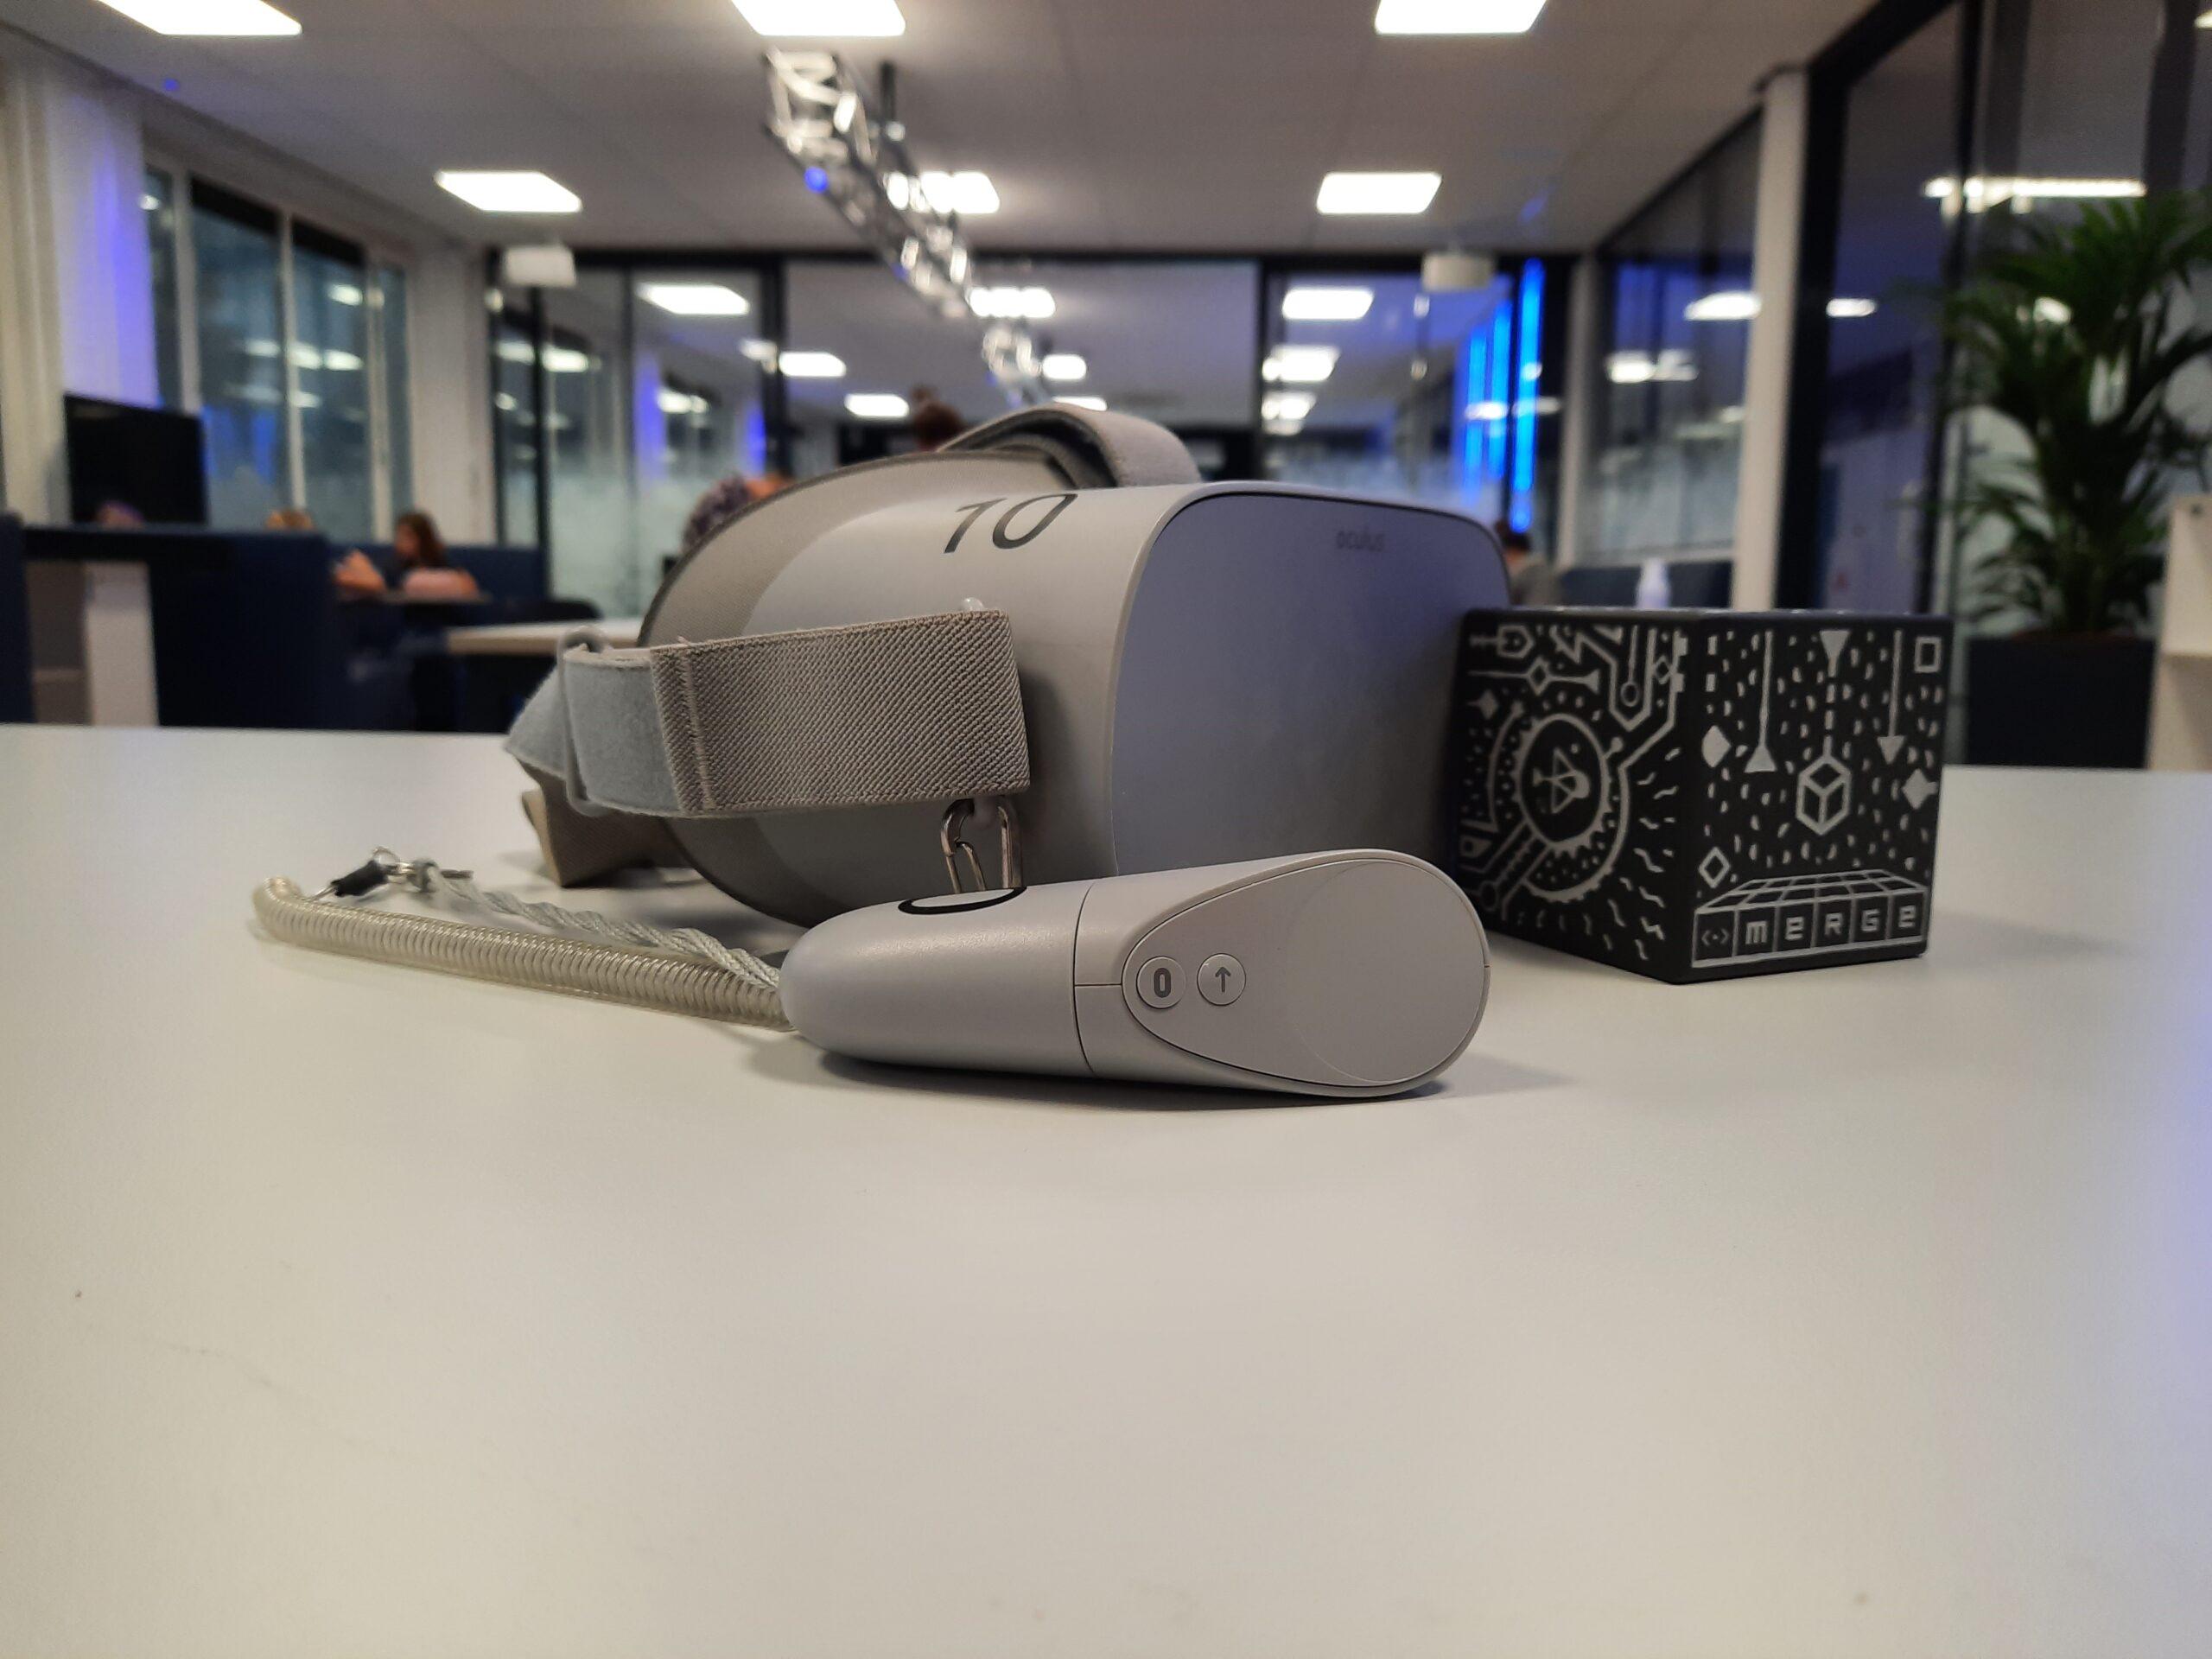 Docententraining VR/AR met Merge Cube